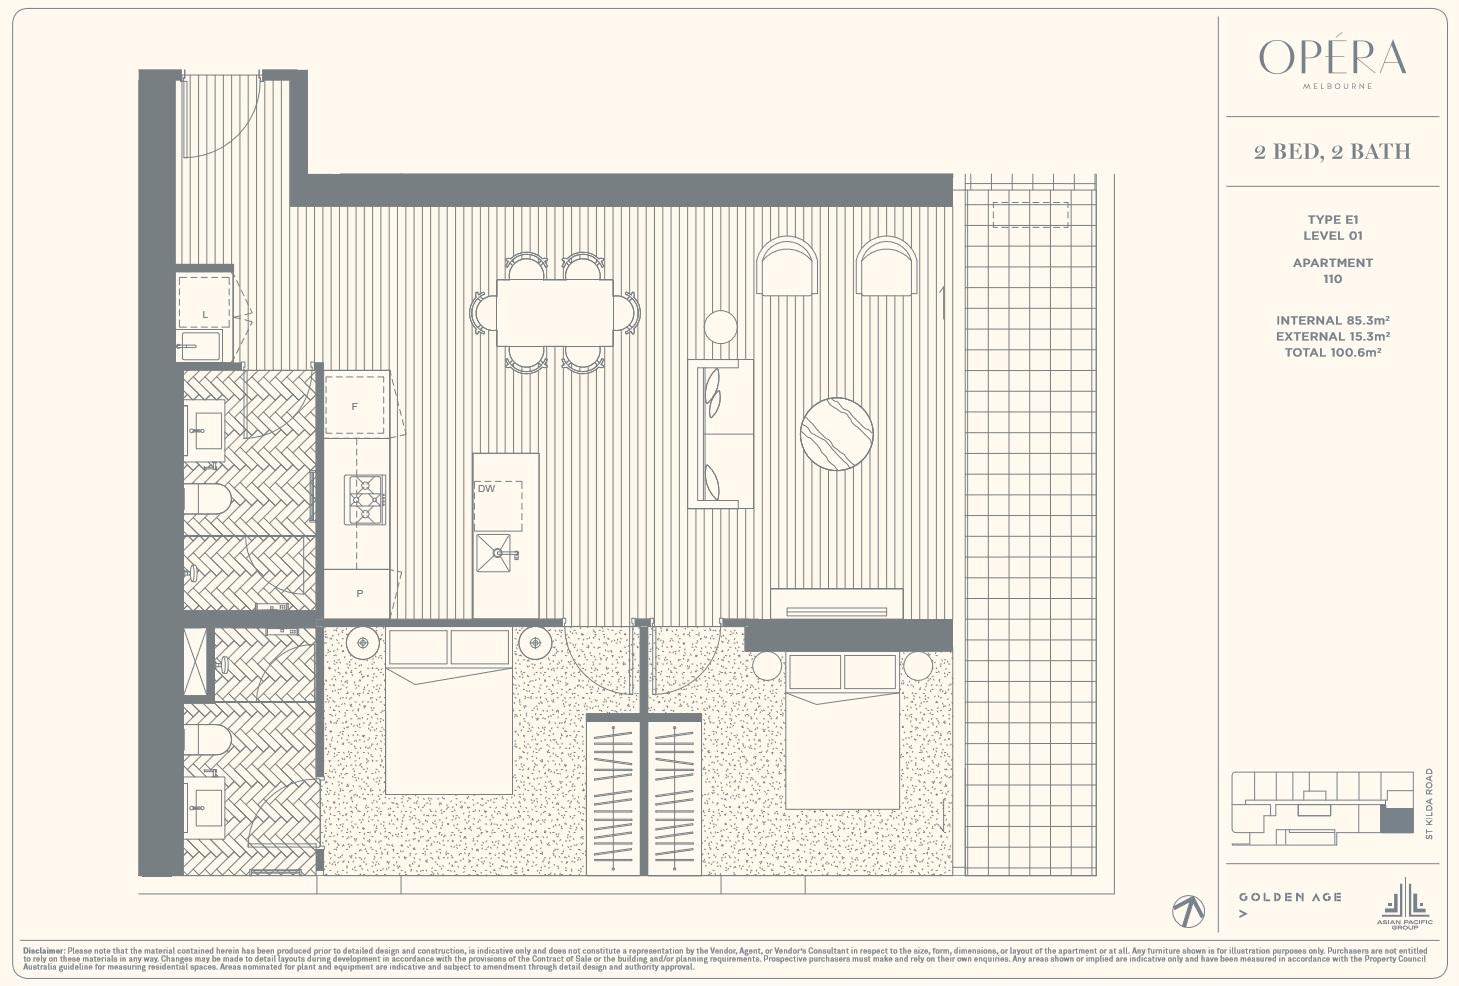 Floor Plan Type E1 - 2Bed2Bath